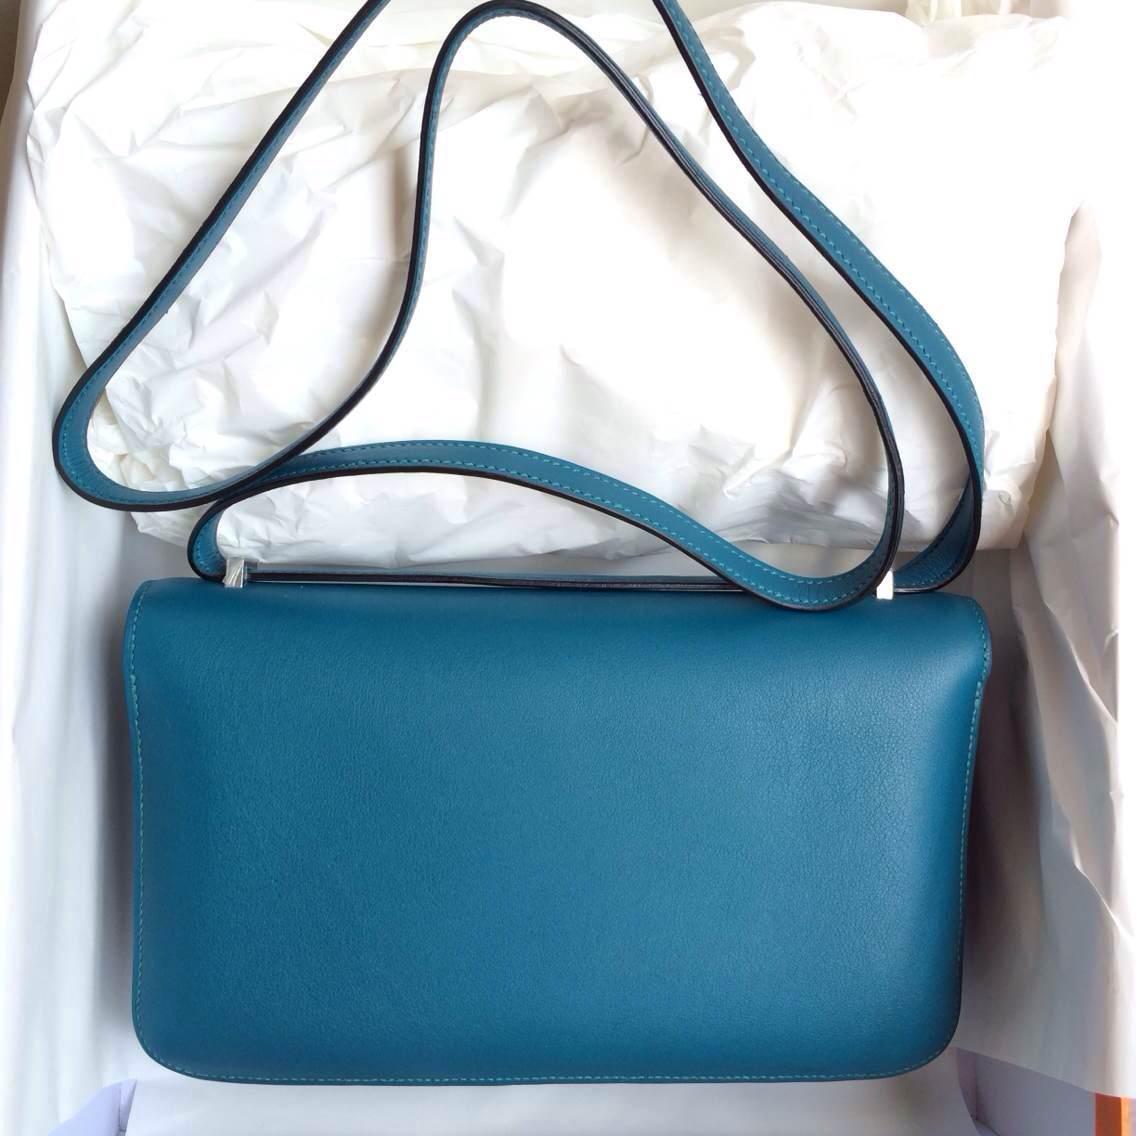 7W Prussian Blue France Swift Leather Hermes Constance elan Bag 26cm